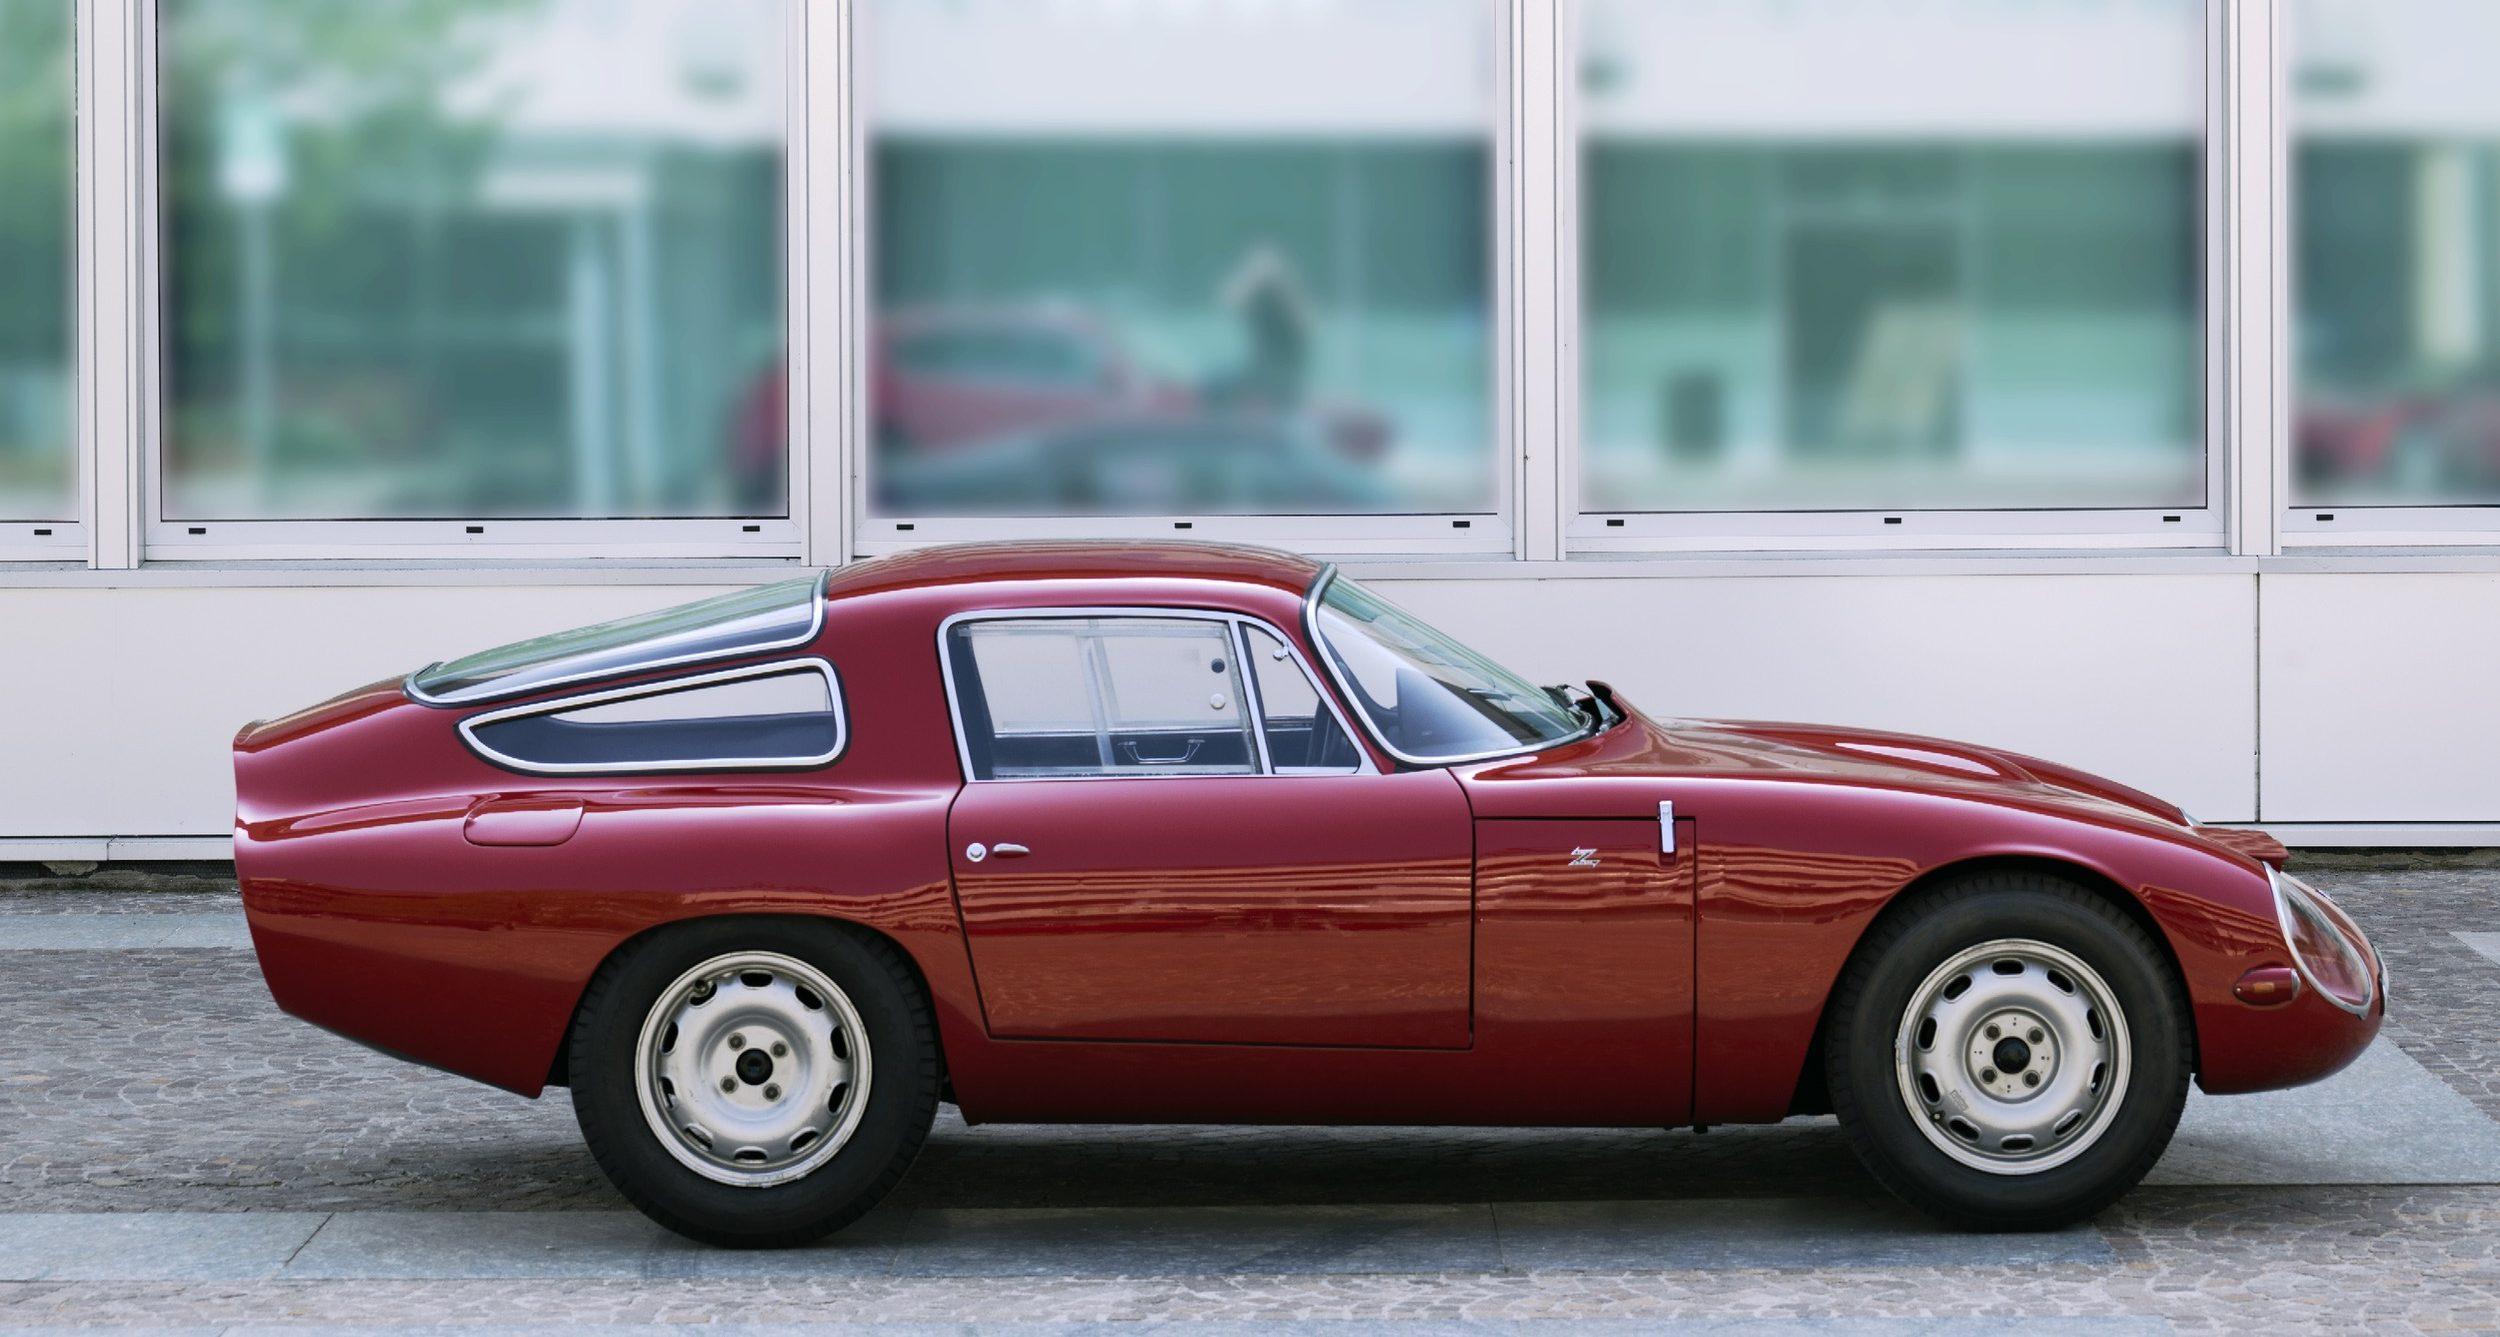 Alfa Romeo Spider Right Door Exterior Window Sweep Stainless Steel trim stripe